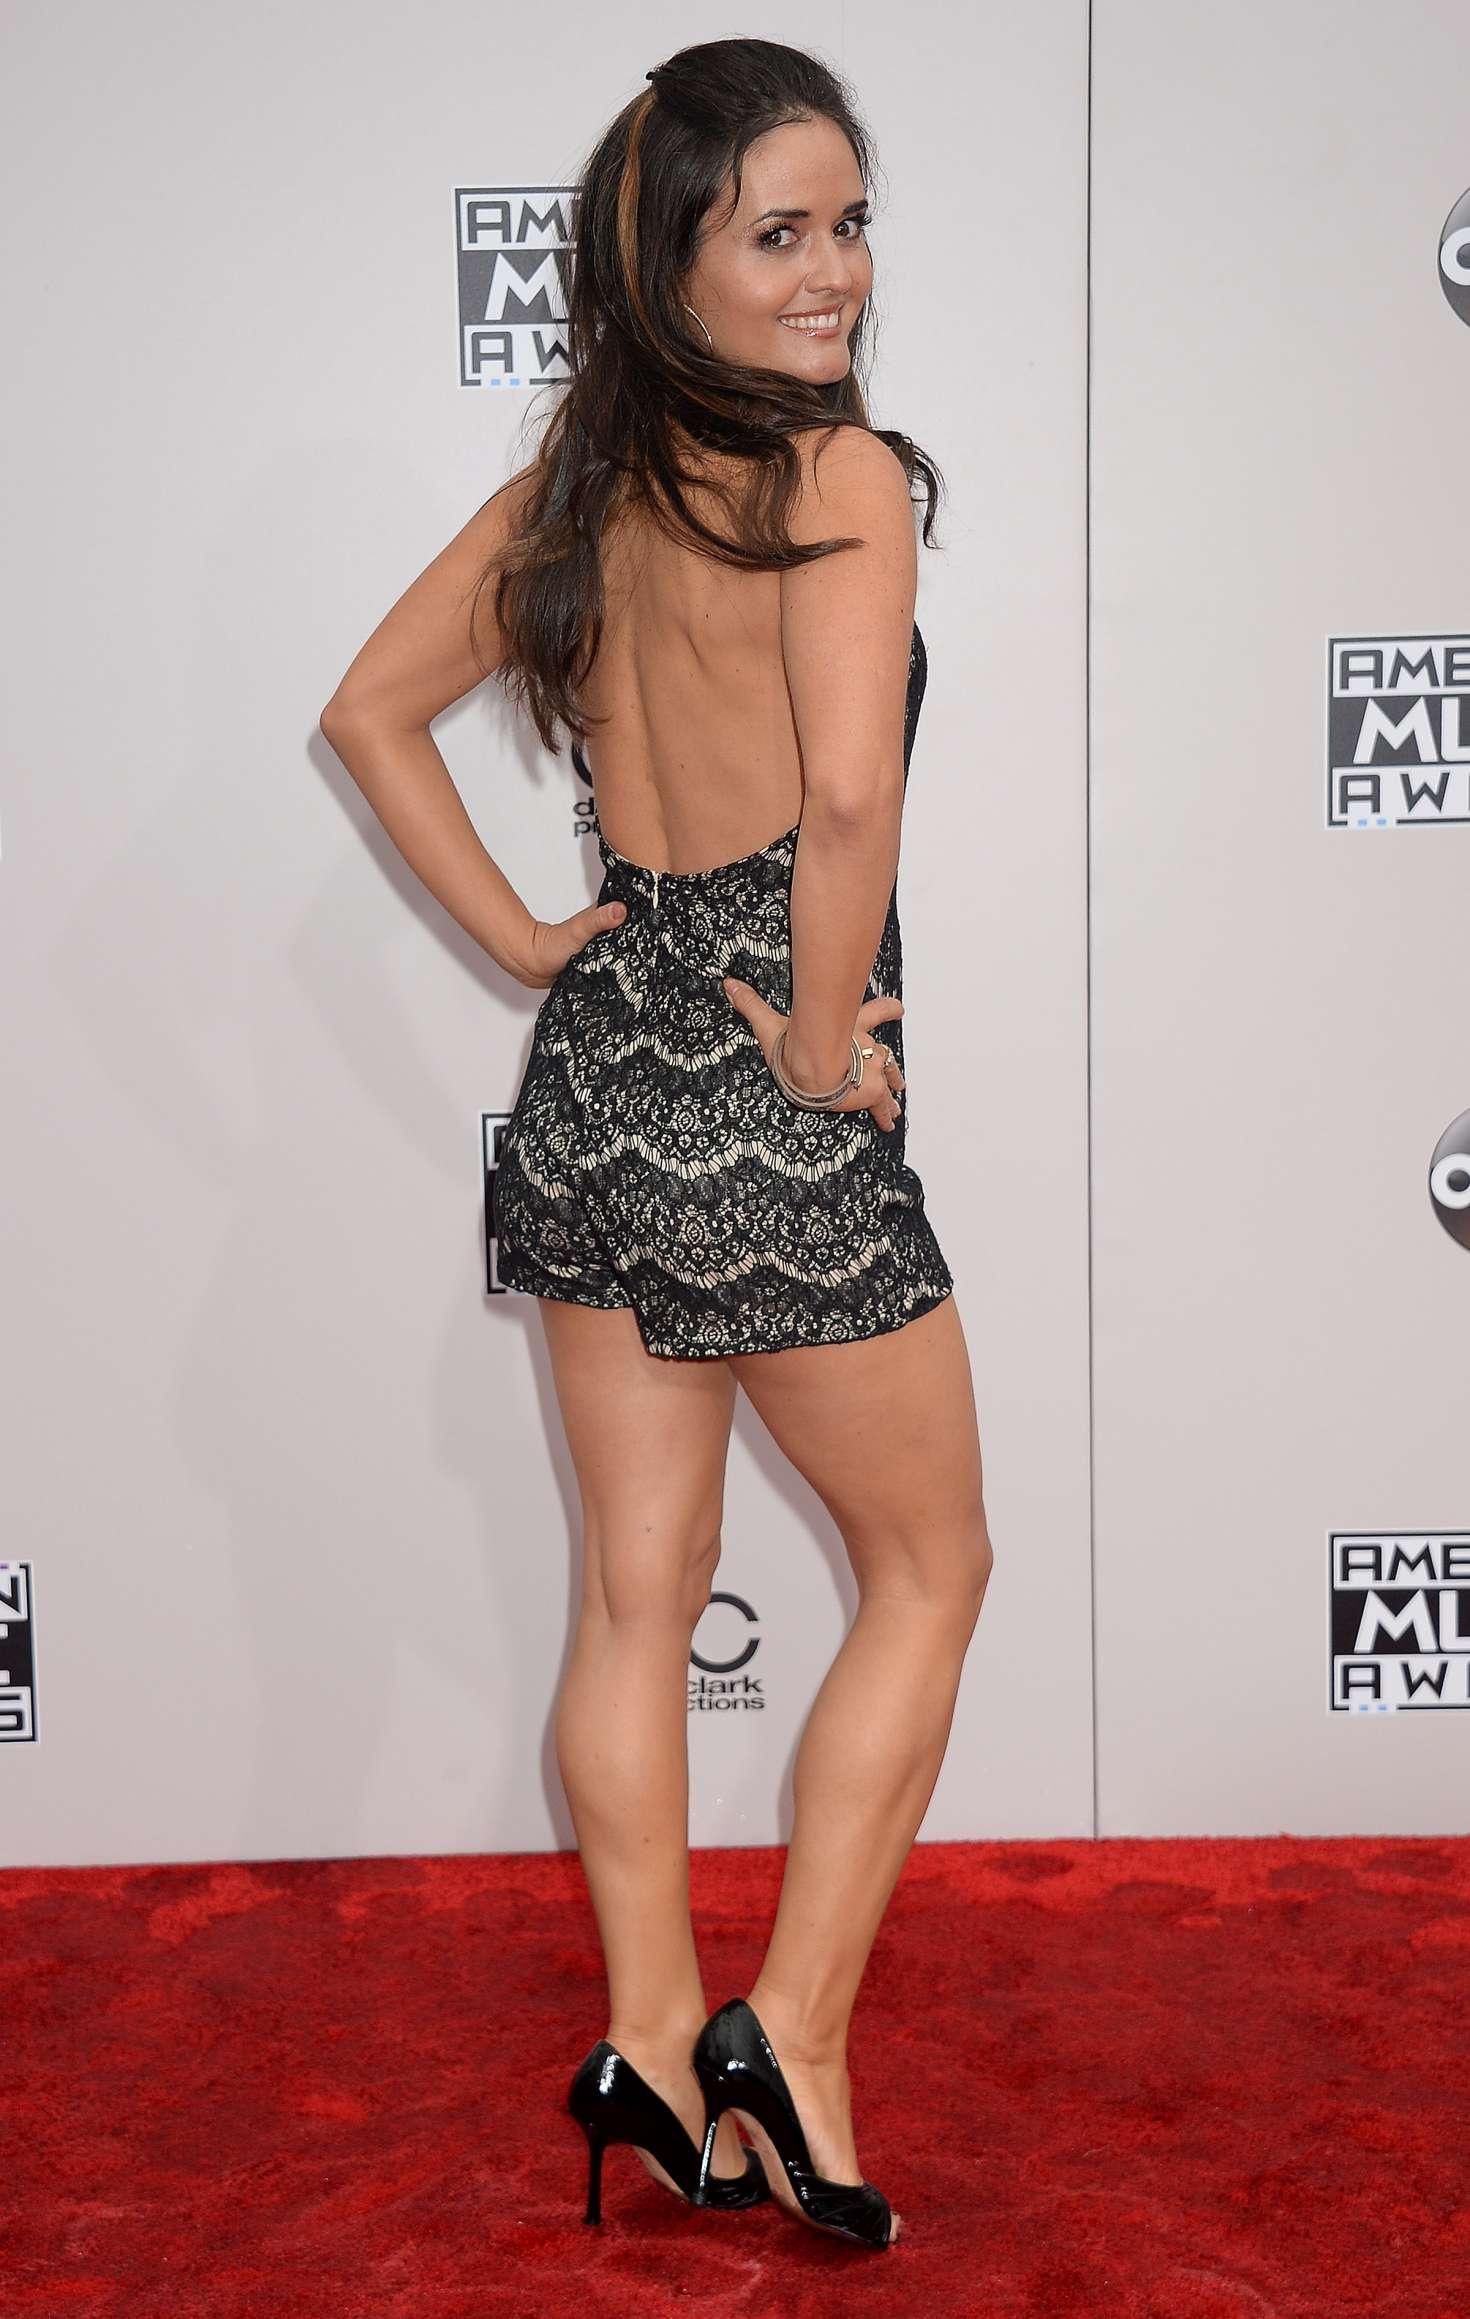 Hot Danica McKellar nudes (31 photo), Tits, Hot, Twitter, cameltoe 2018